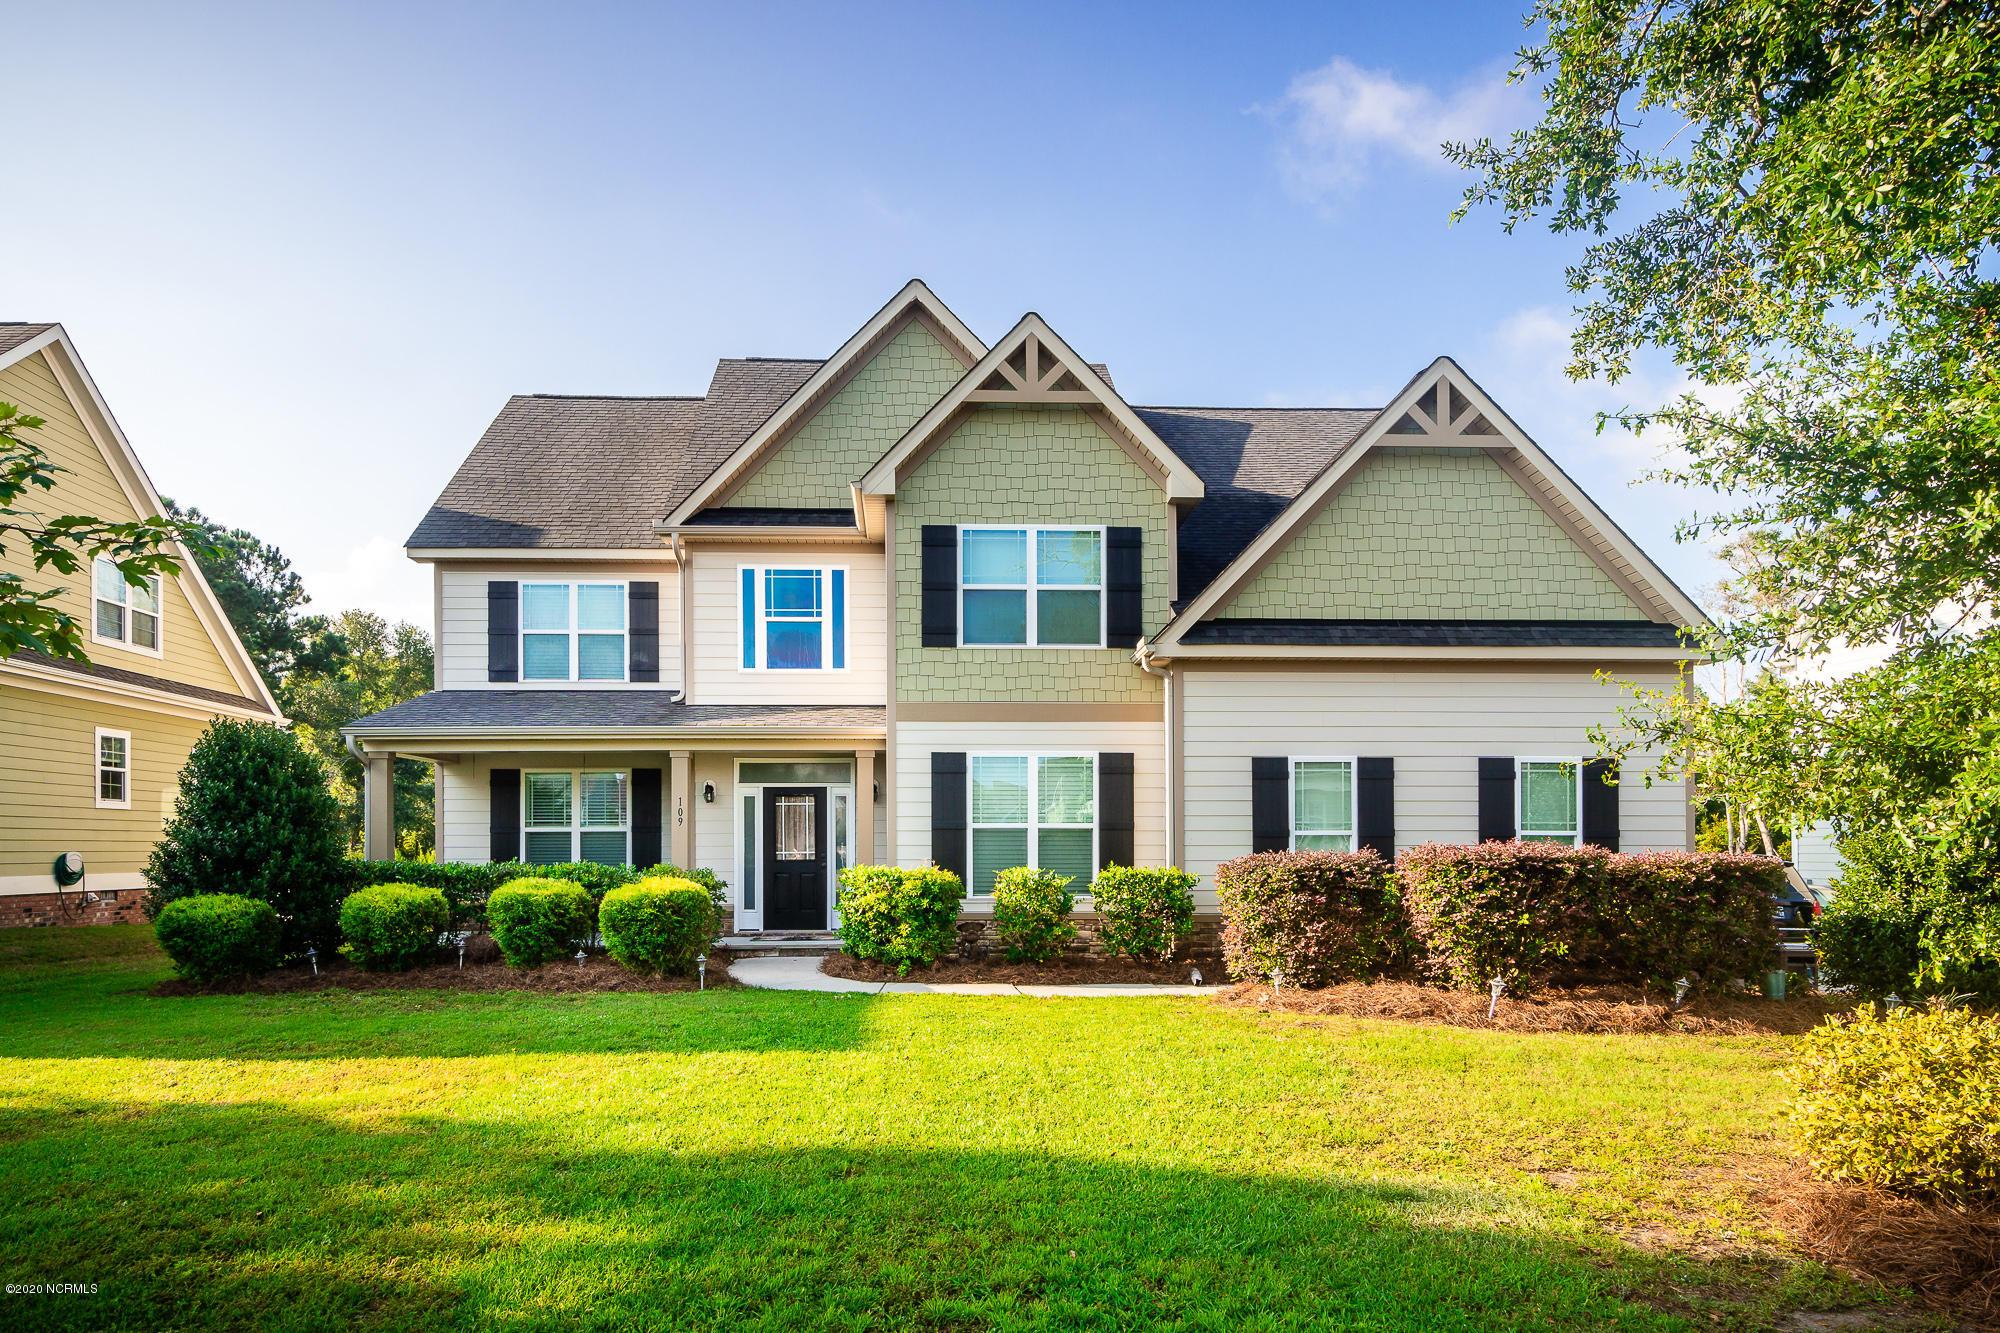 109 Marsh Island Drive, Cedar Point, North Carolina 28584, 4 Bedrooms Bedrooms, ,4 BathroomsBathrooms,Residential,For Sale,Marsh Island,100235134